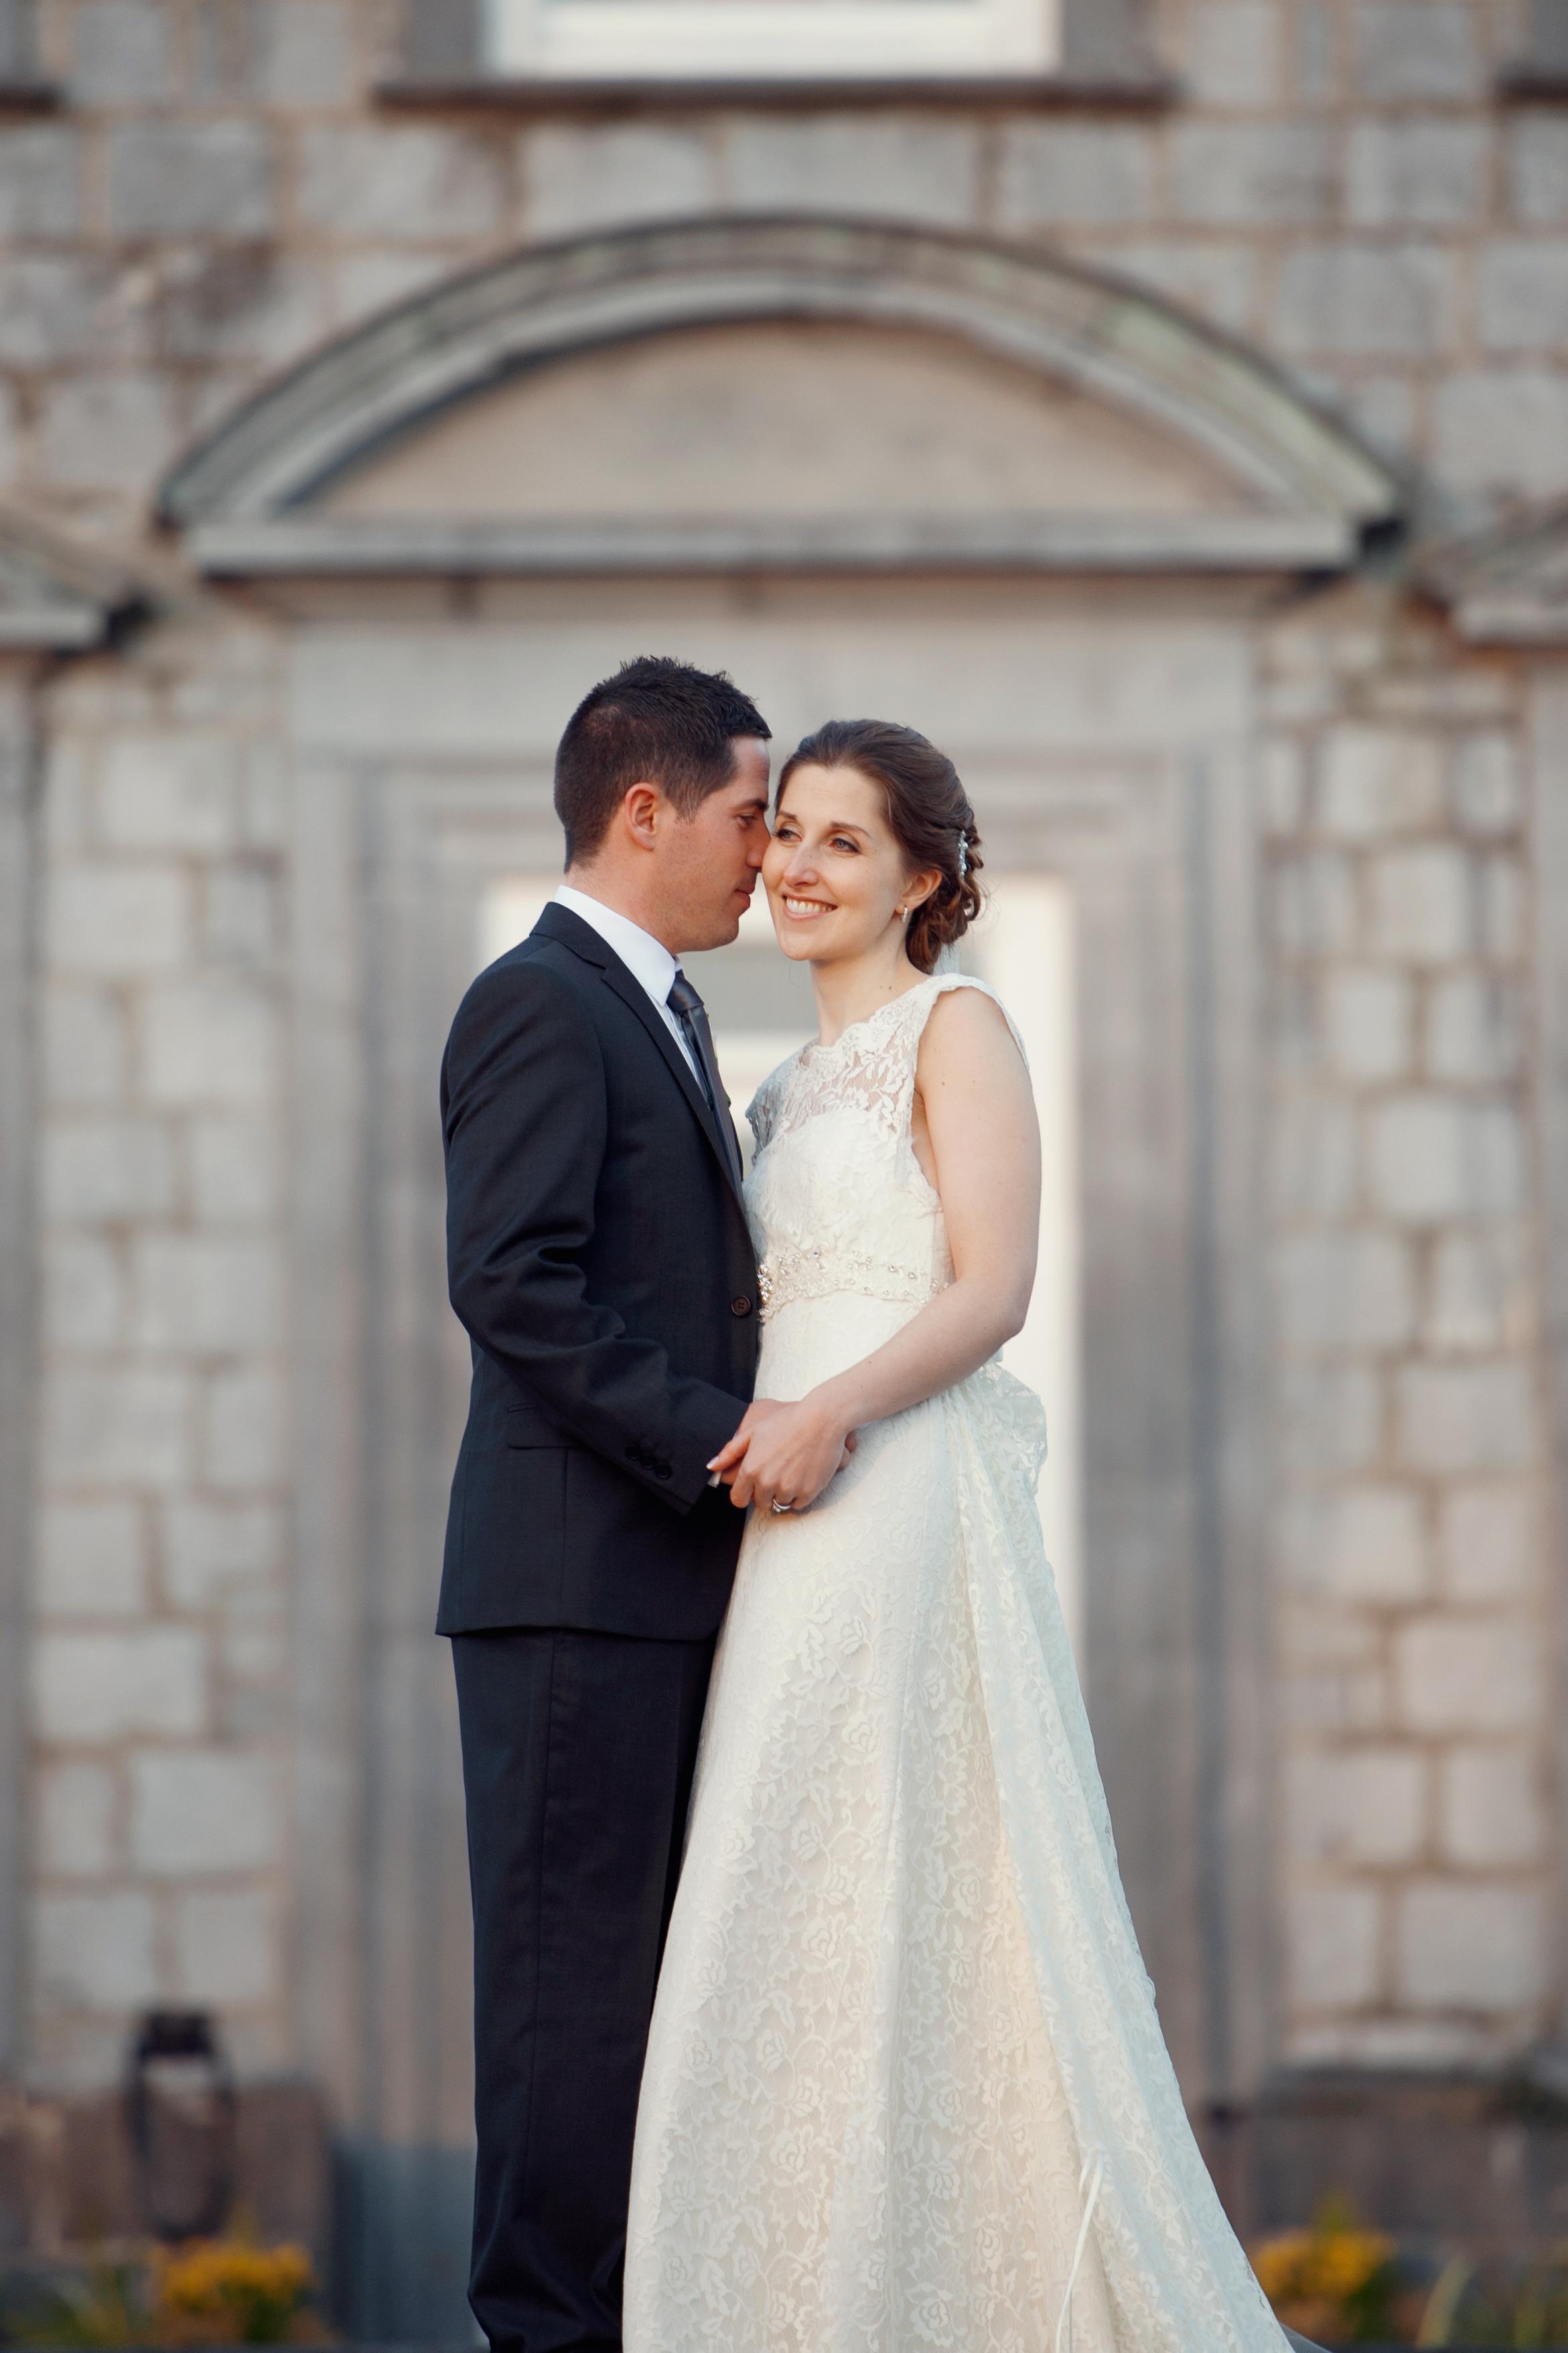 Wedding Photography Ireland Castle Durrow Laois Irish Wedding Photographer 107.jpg